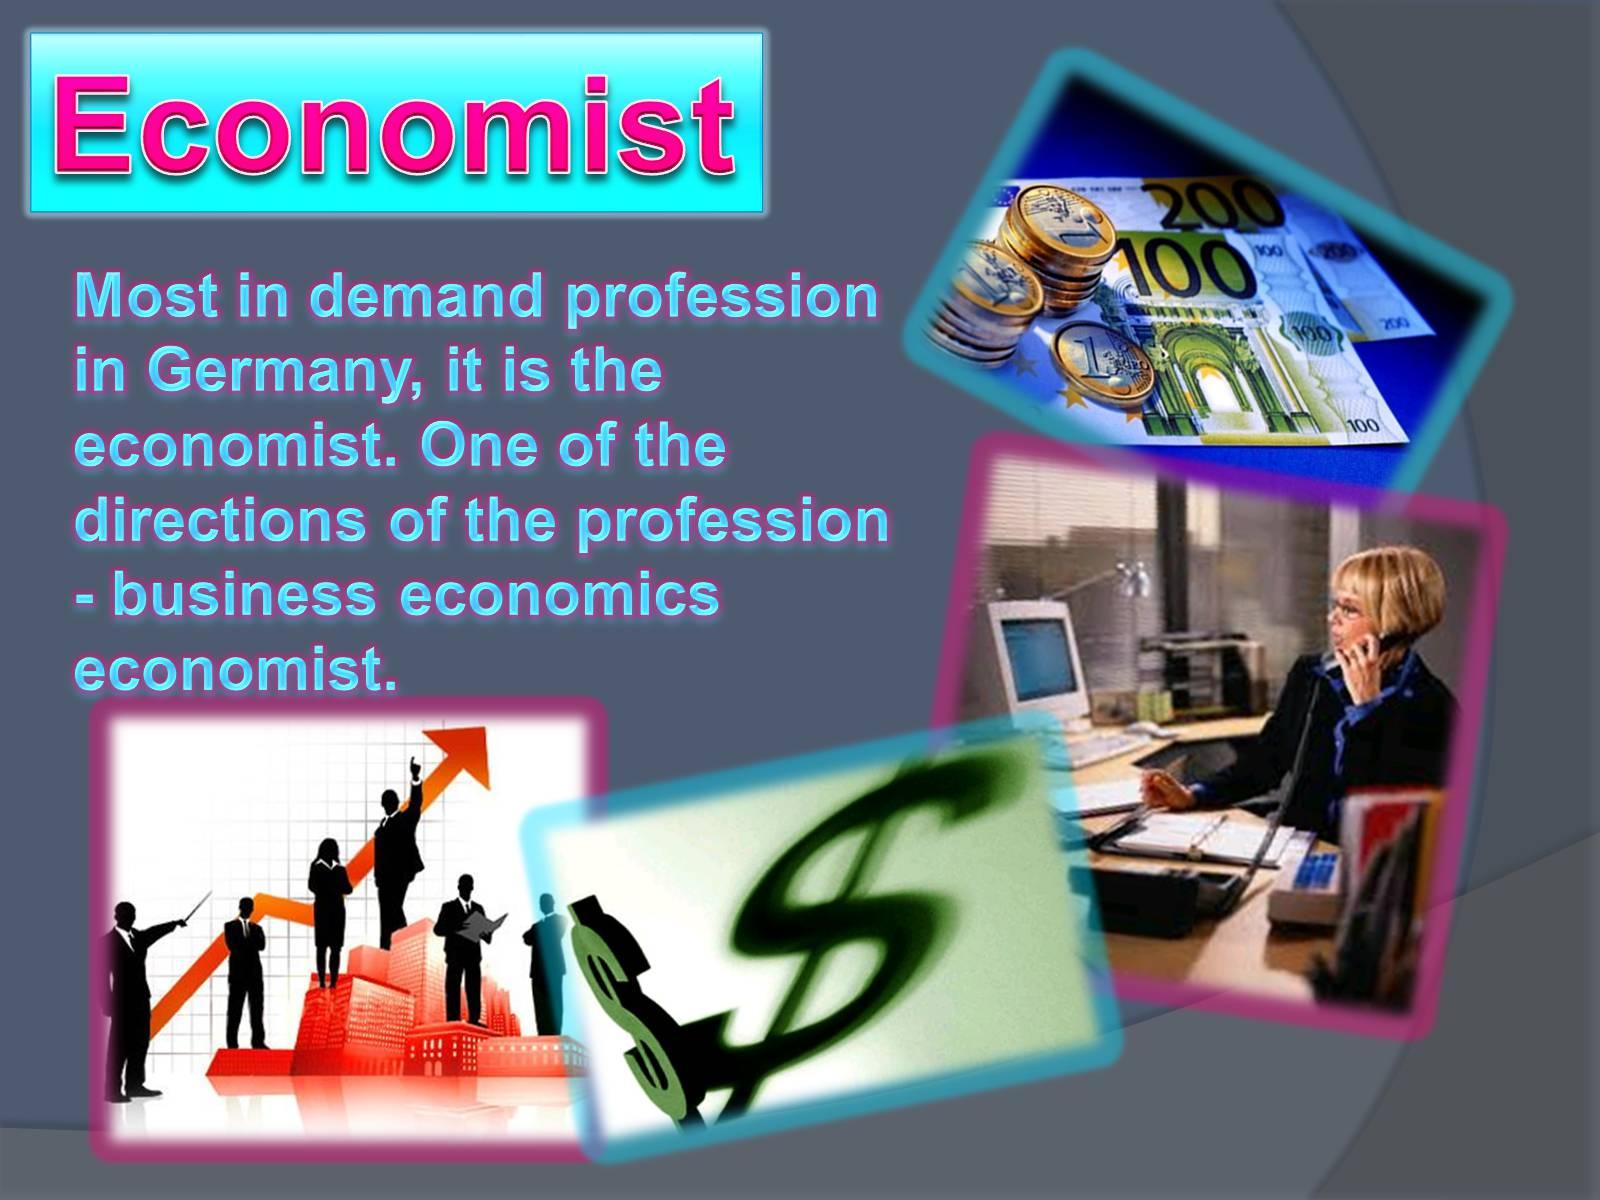 картинки экономист на английском